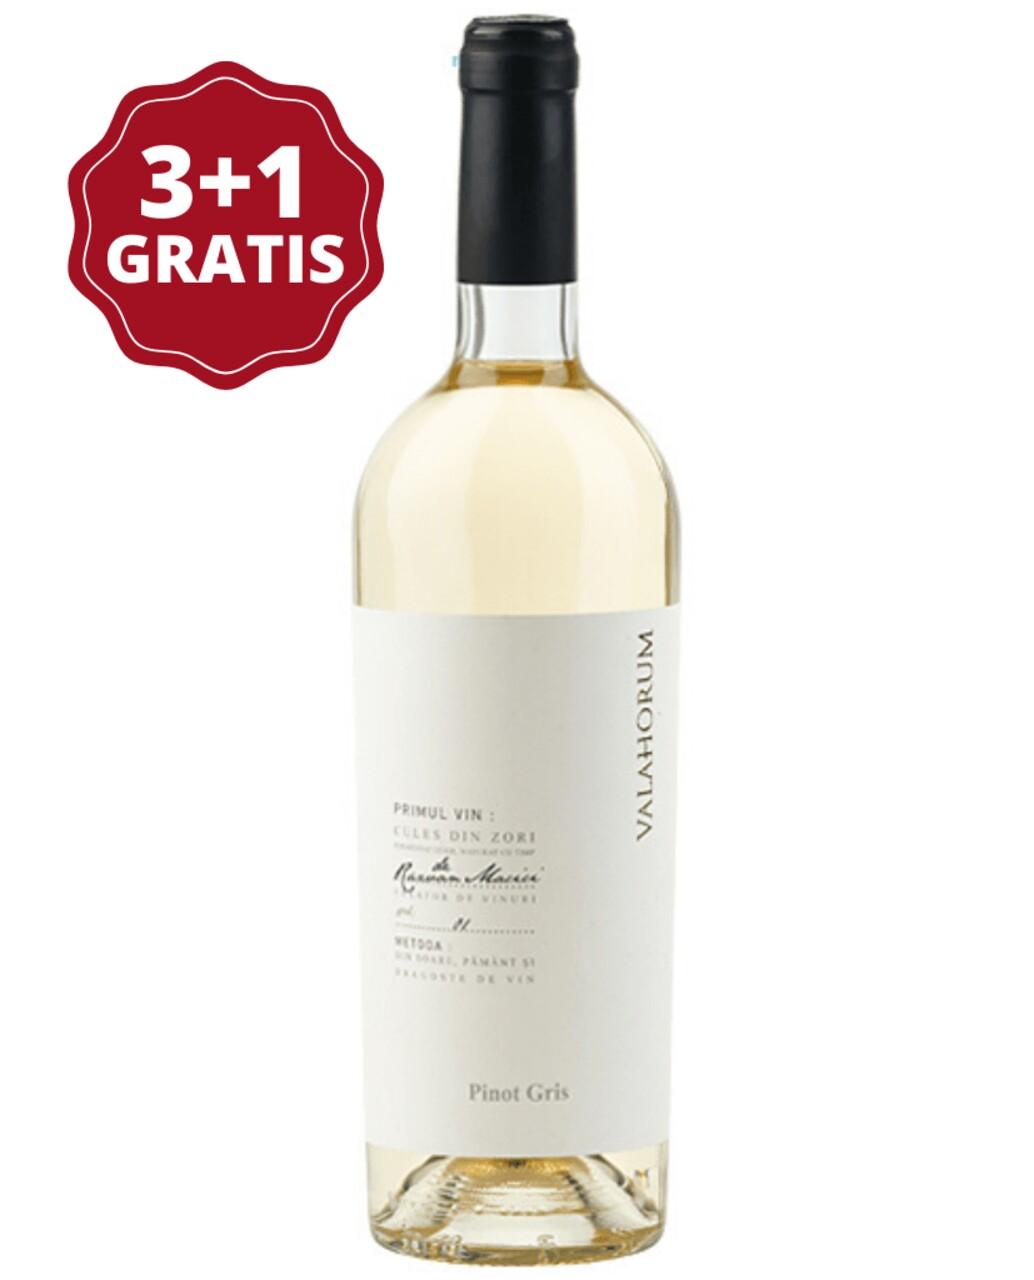 Valahorum Pinot Gris 3+1